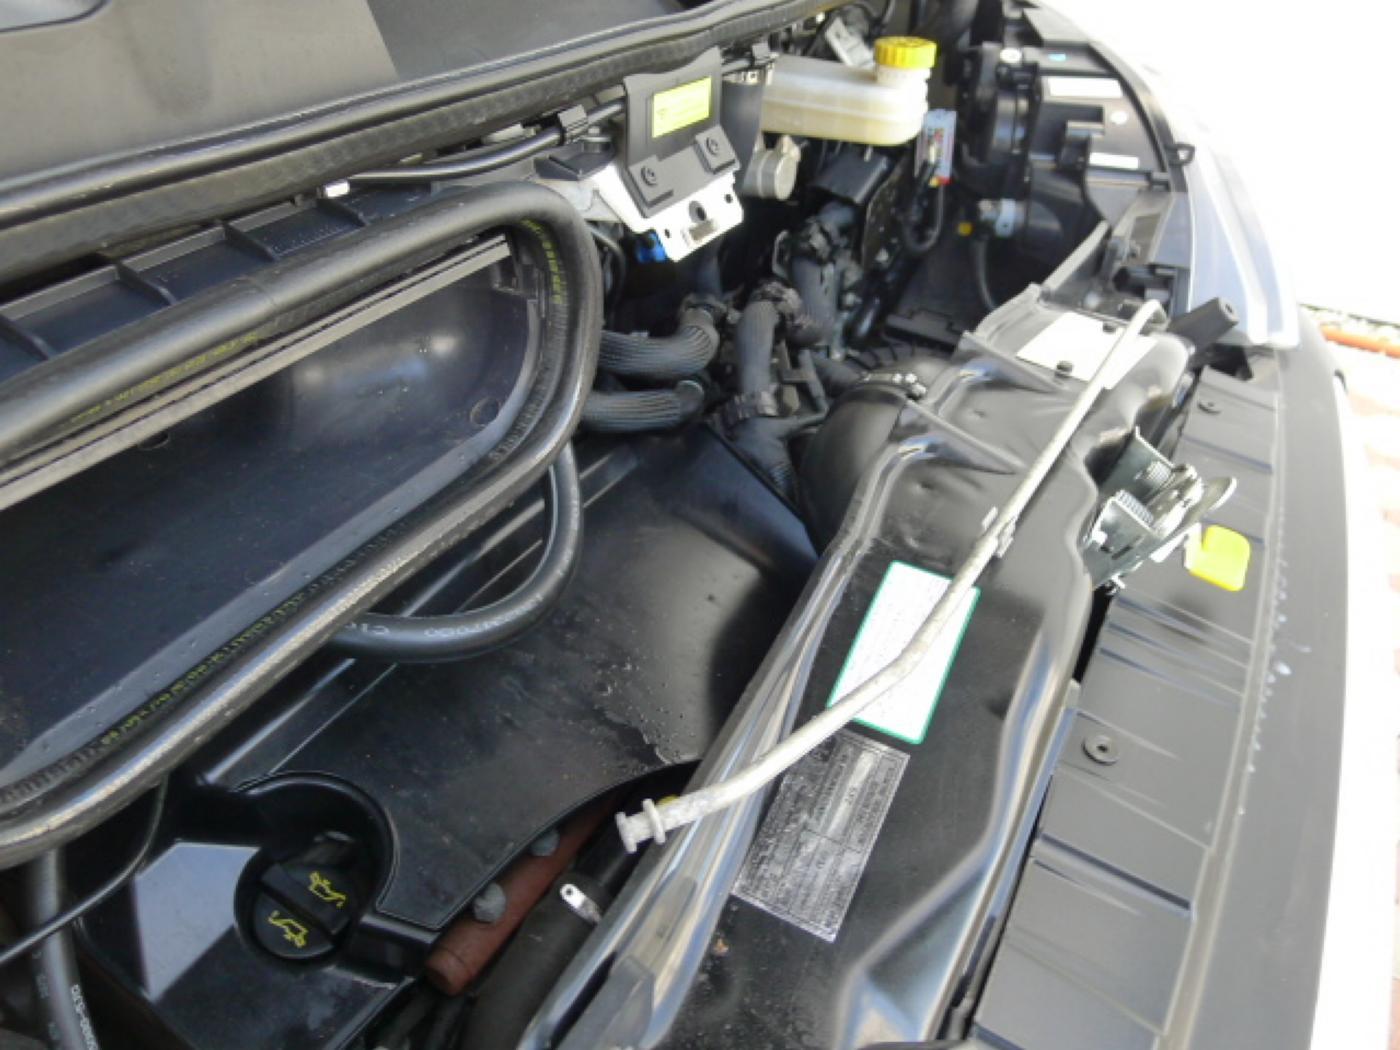 Peugeot Boxer 2,2 HDI Valnik+Plachta+Klima+Mìchy - 20